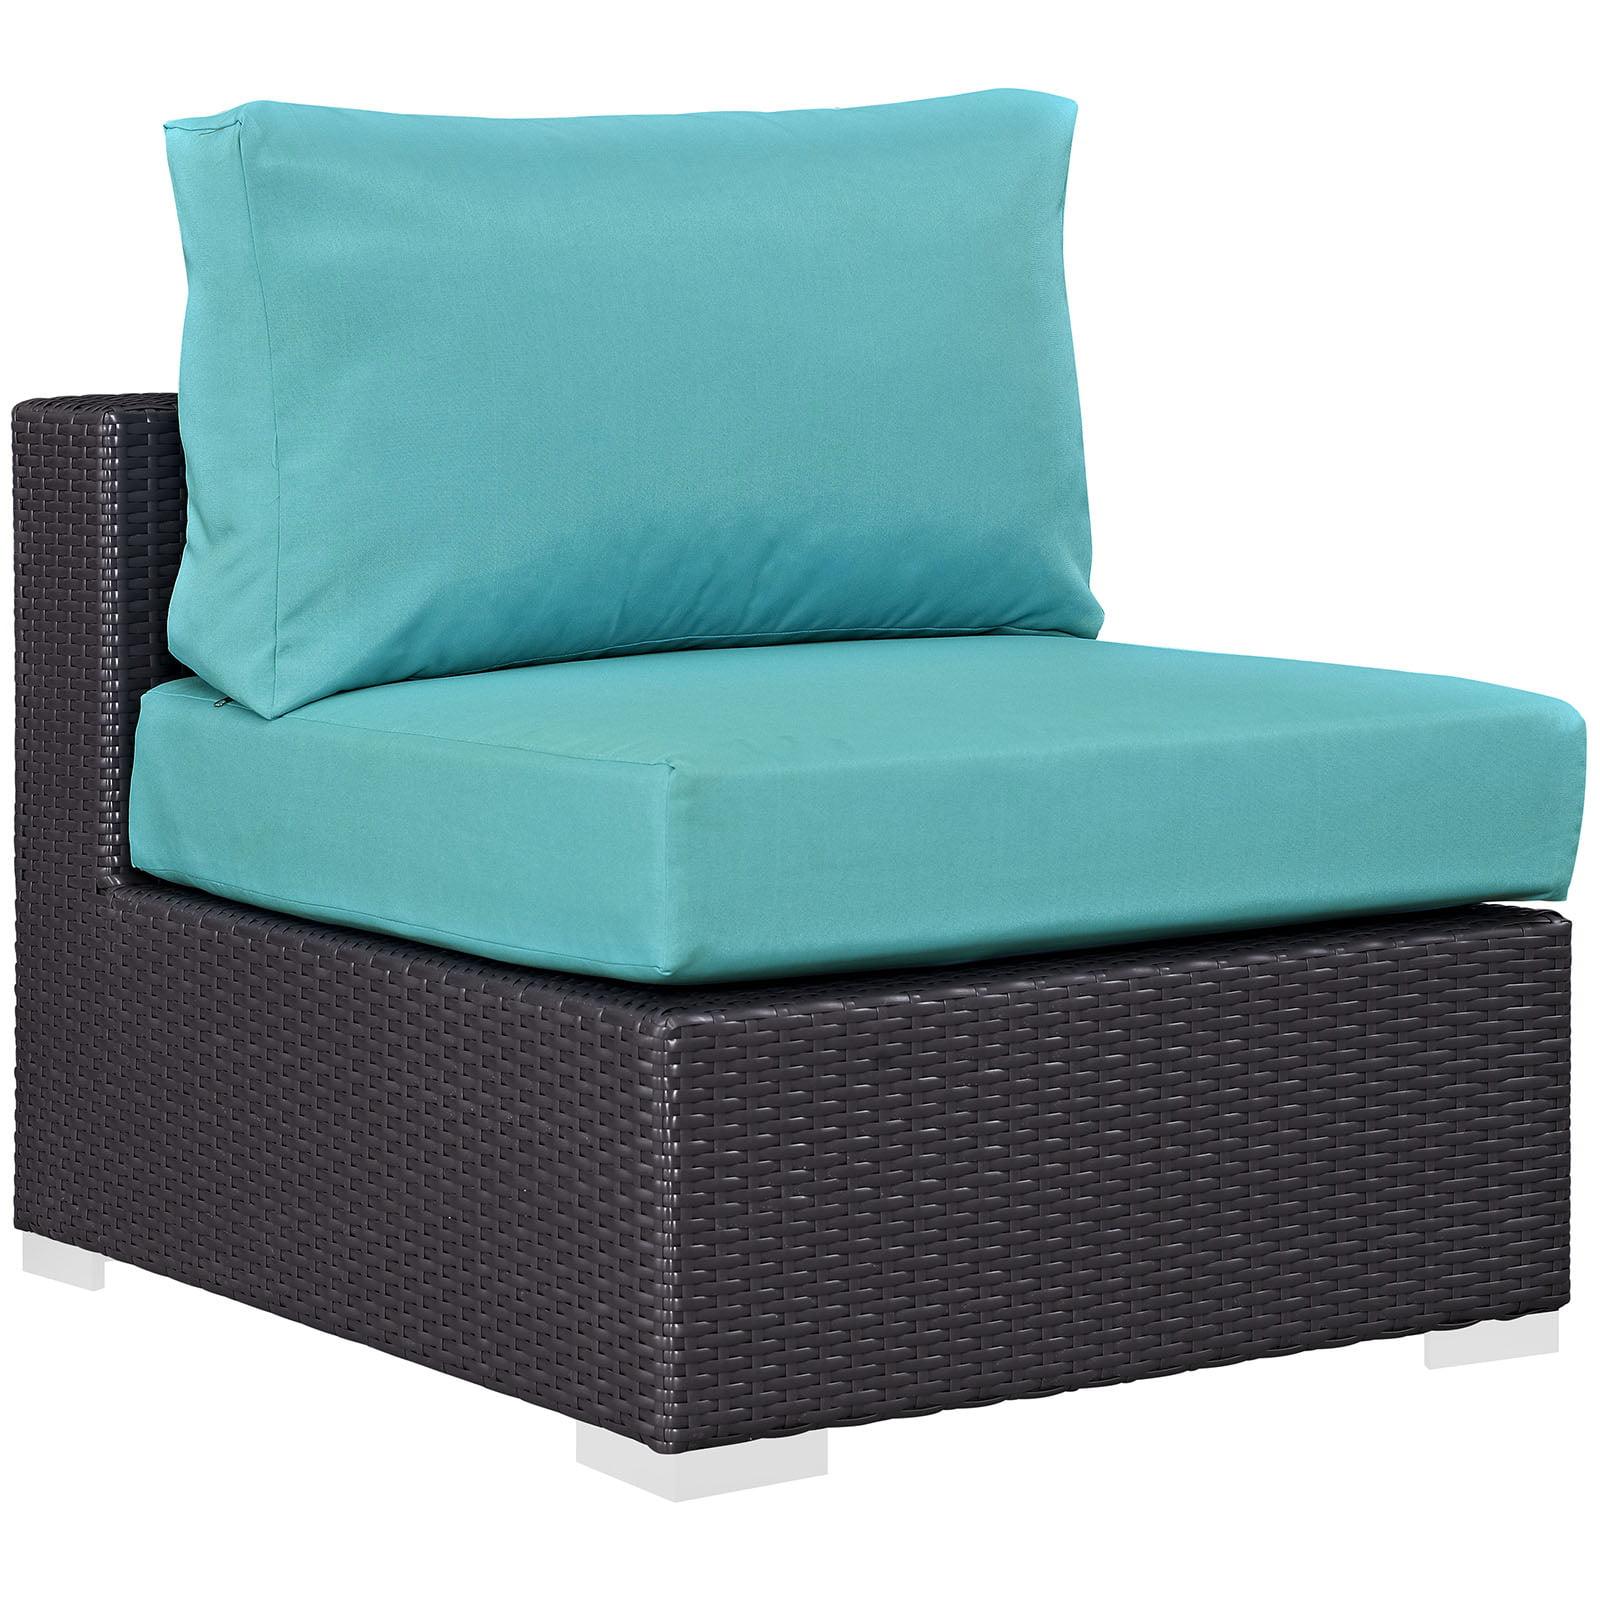 Modern Contemporary Urban Design Outdoor Patio Balcony Lounge Chair, Blue, Rattan